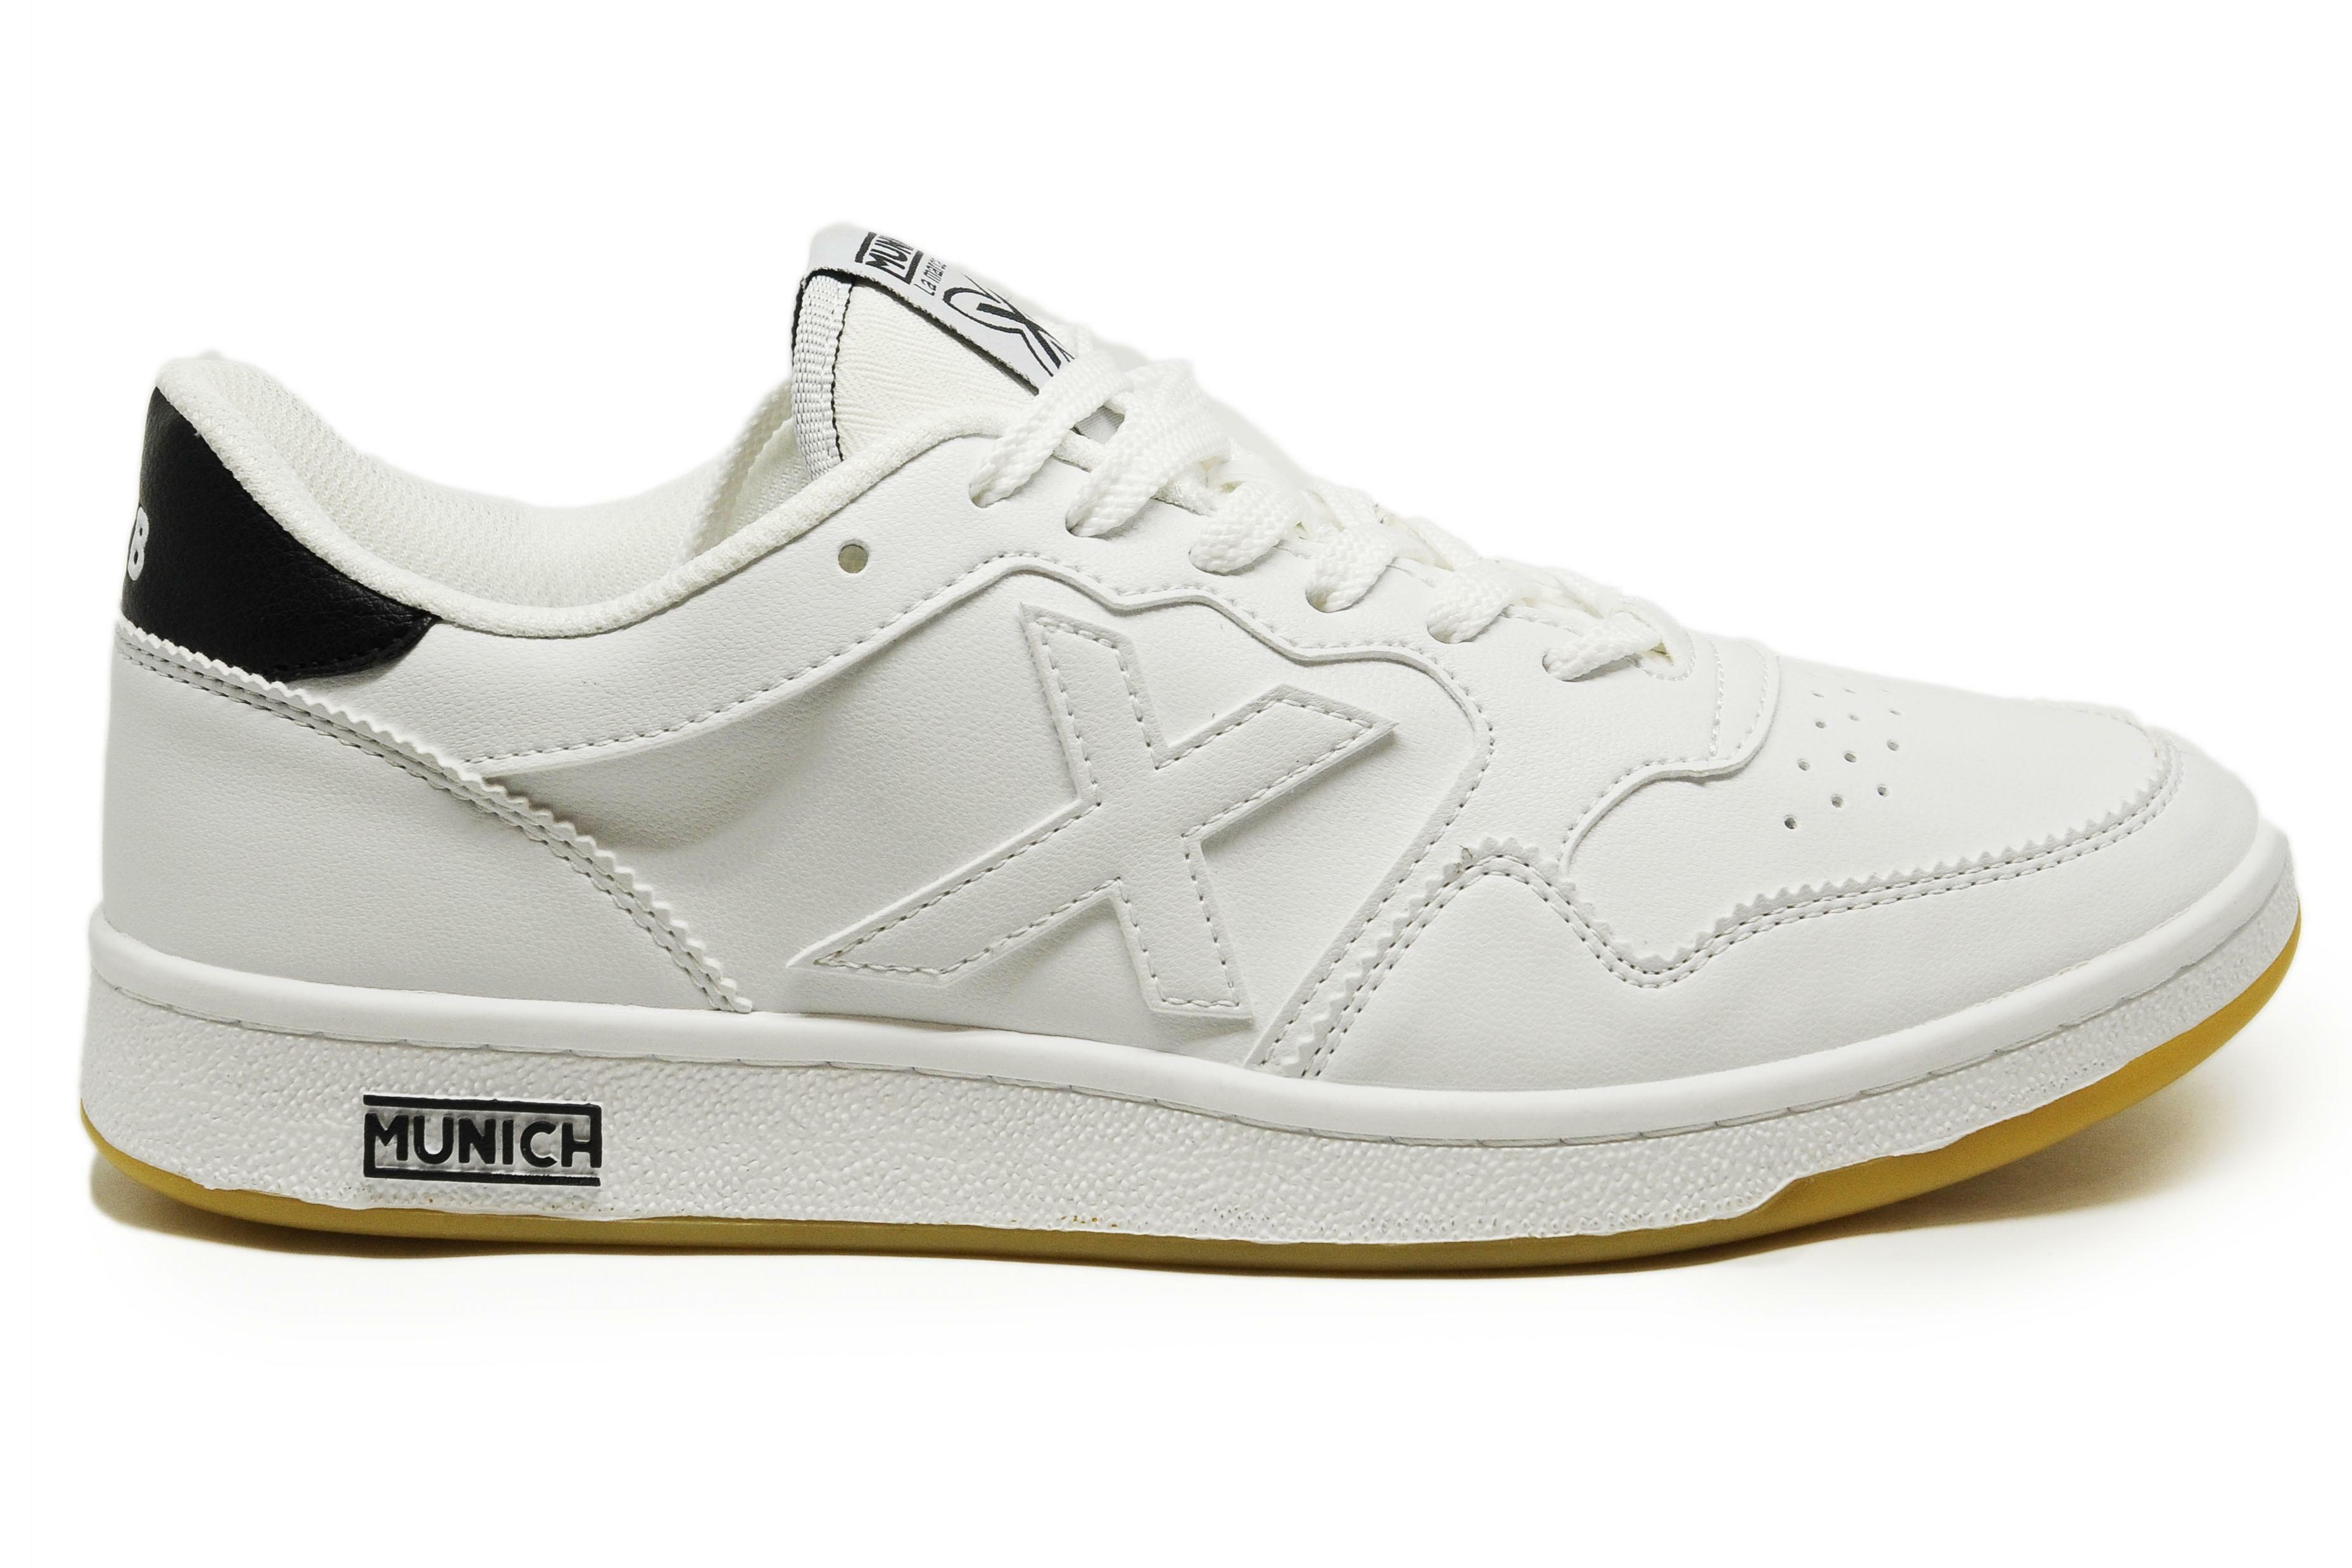 munich munich scarpa sneaker arrow bianco